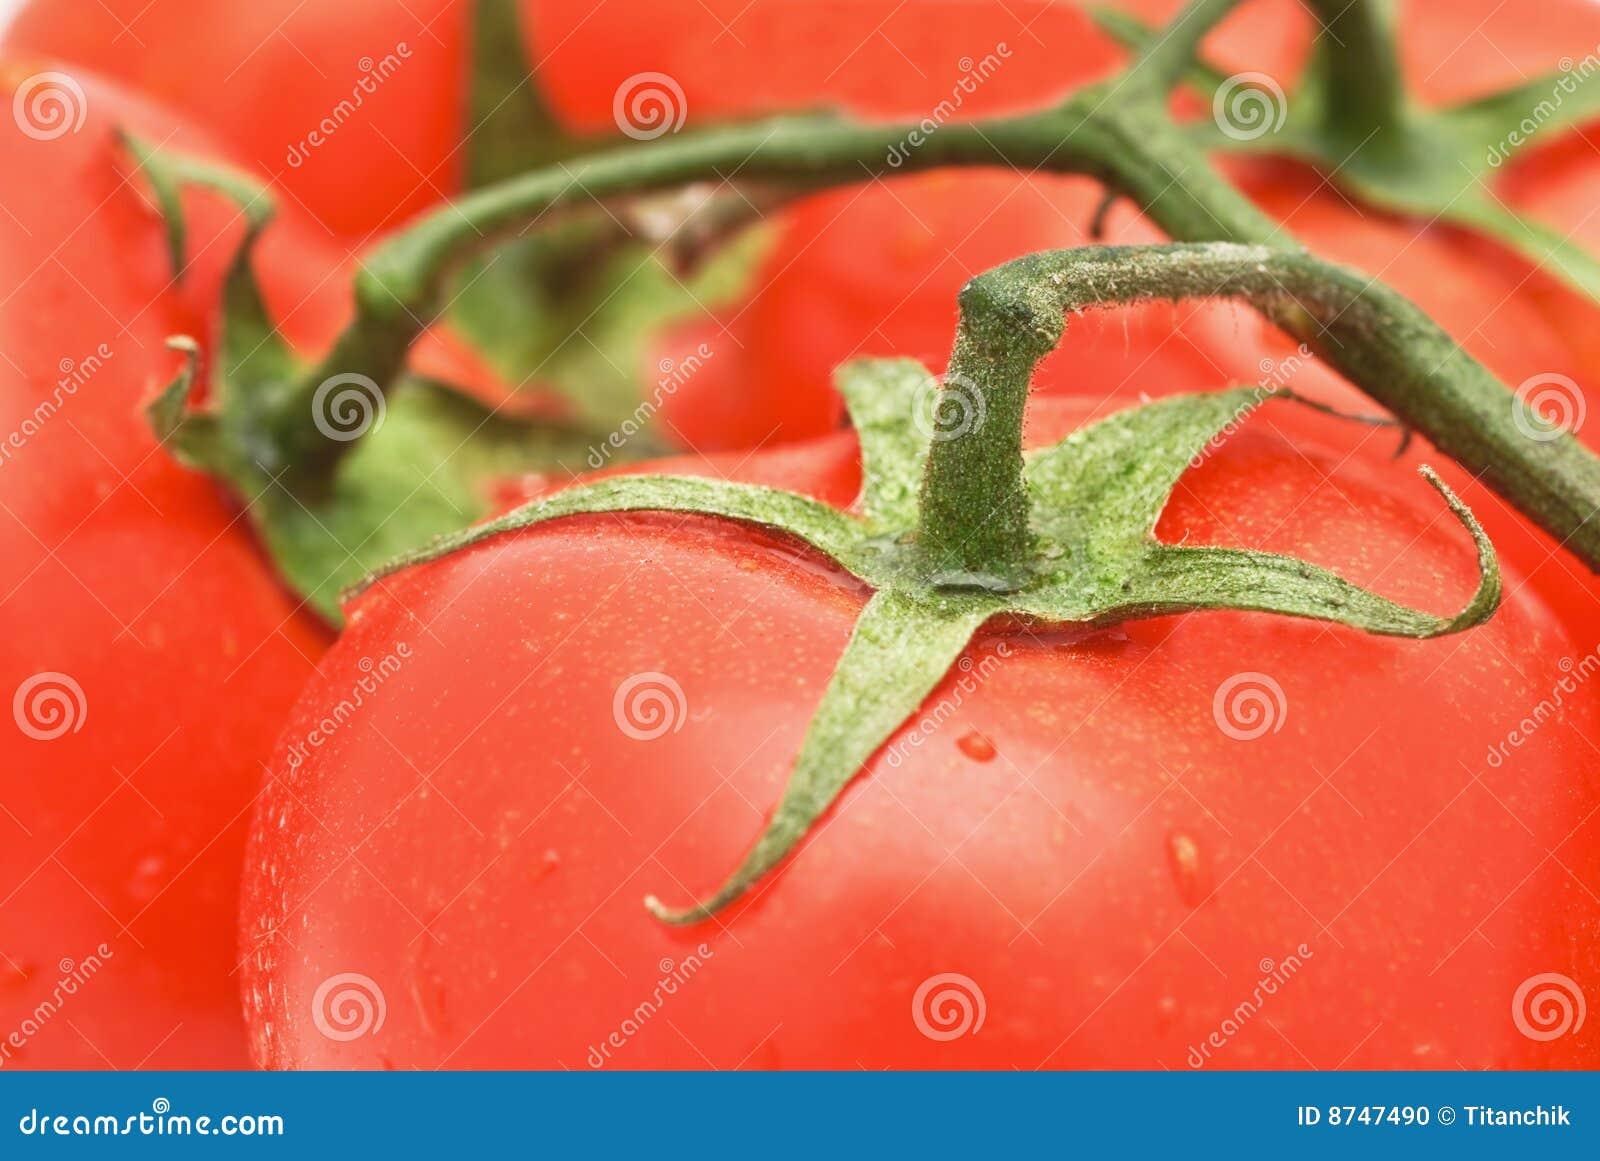 Vegetarian Meals- tomato